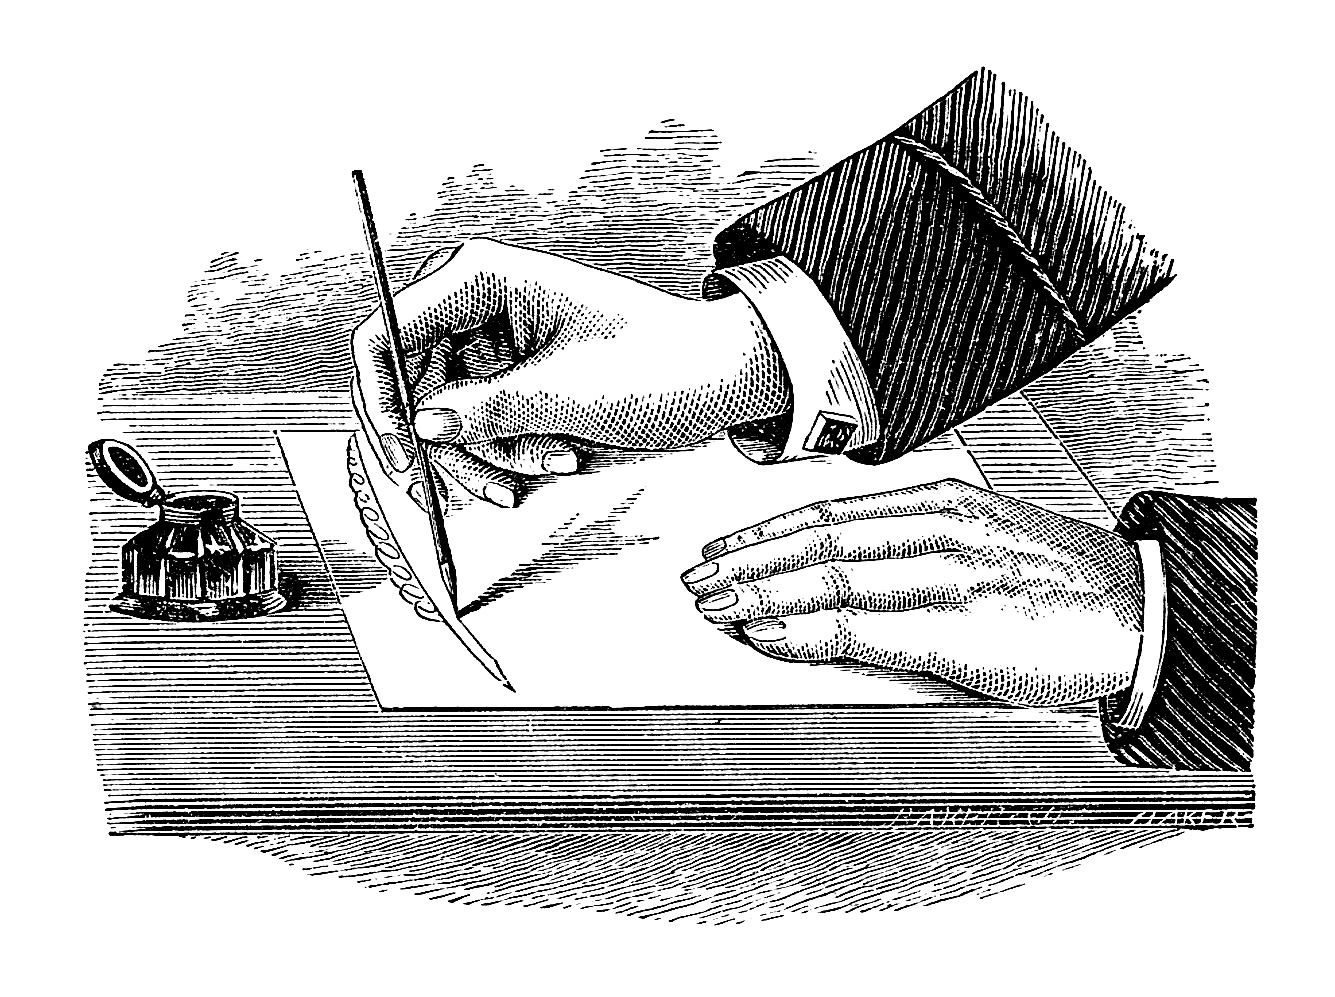 Illustrative essay